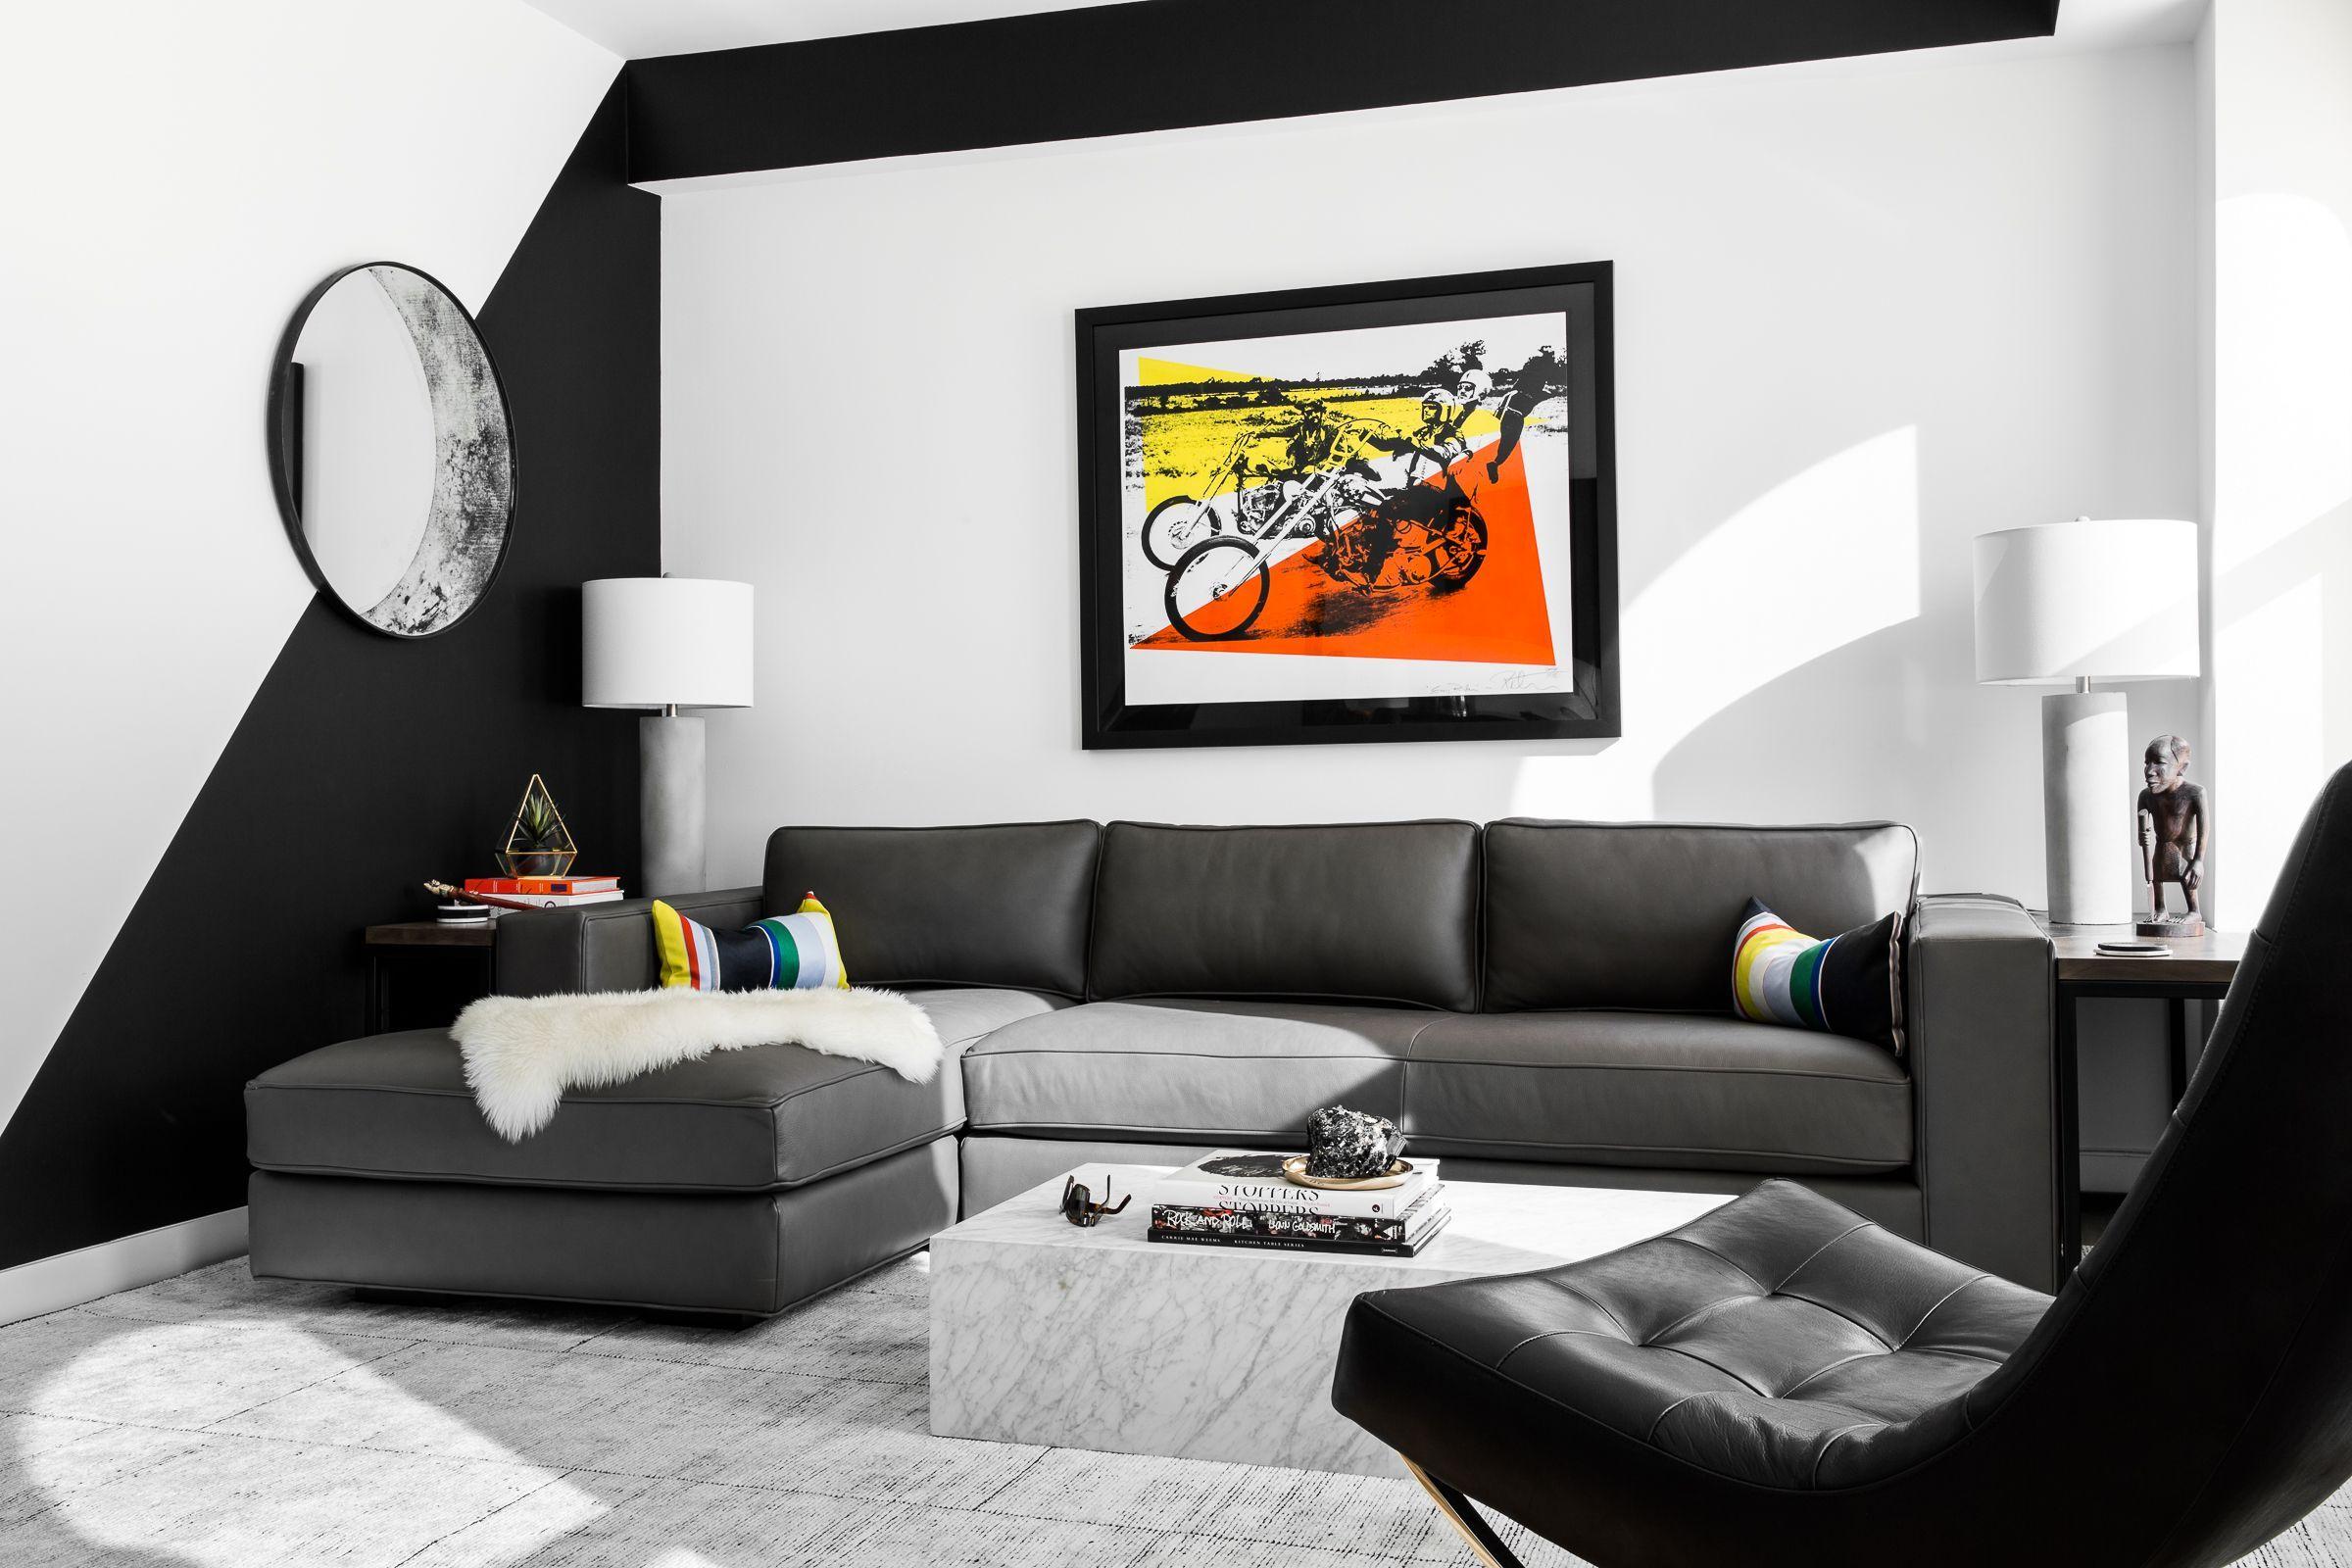 Decor By Structurelinks Homepolish Interior Designer Nicole Watts Strips The